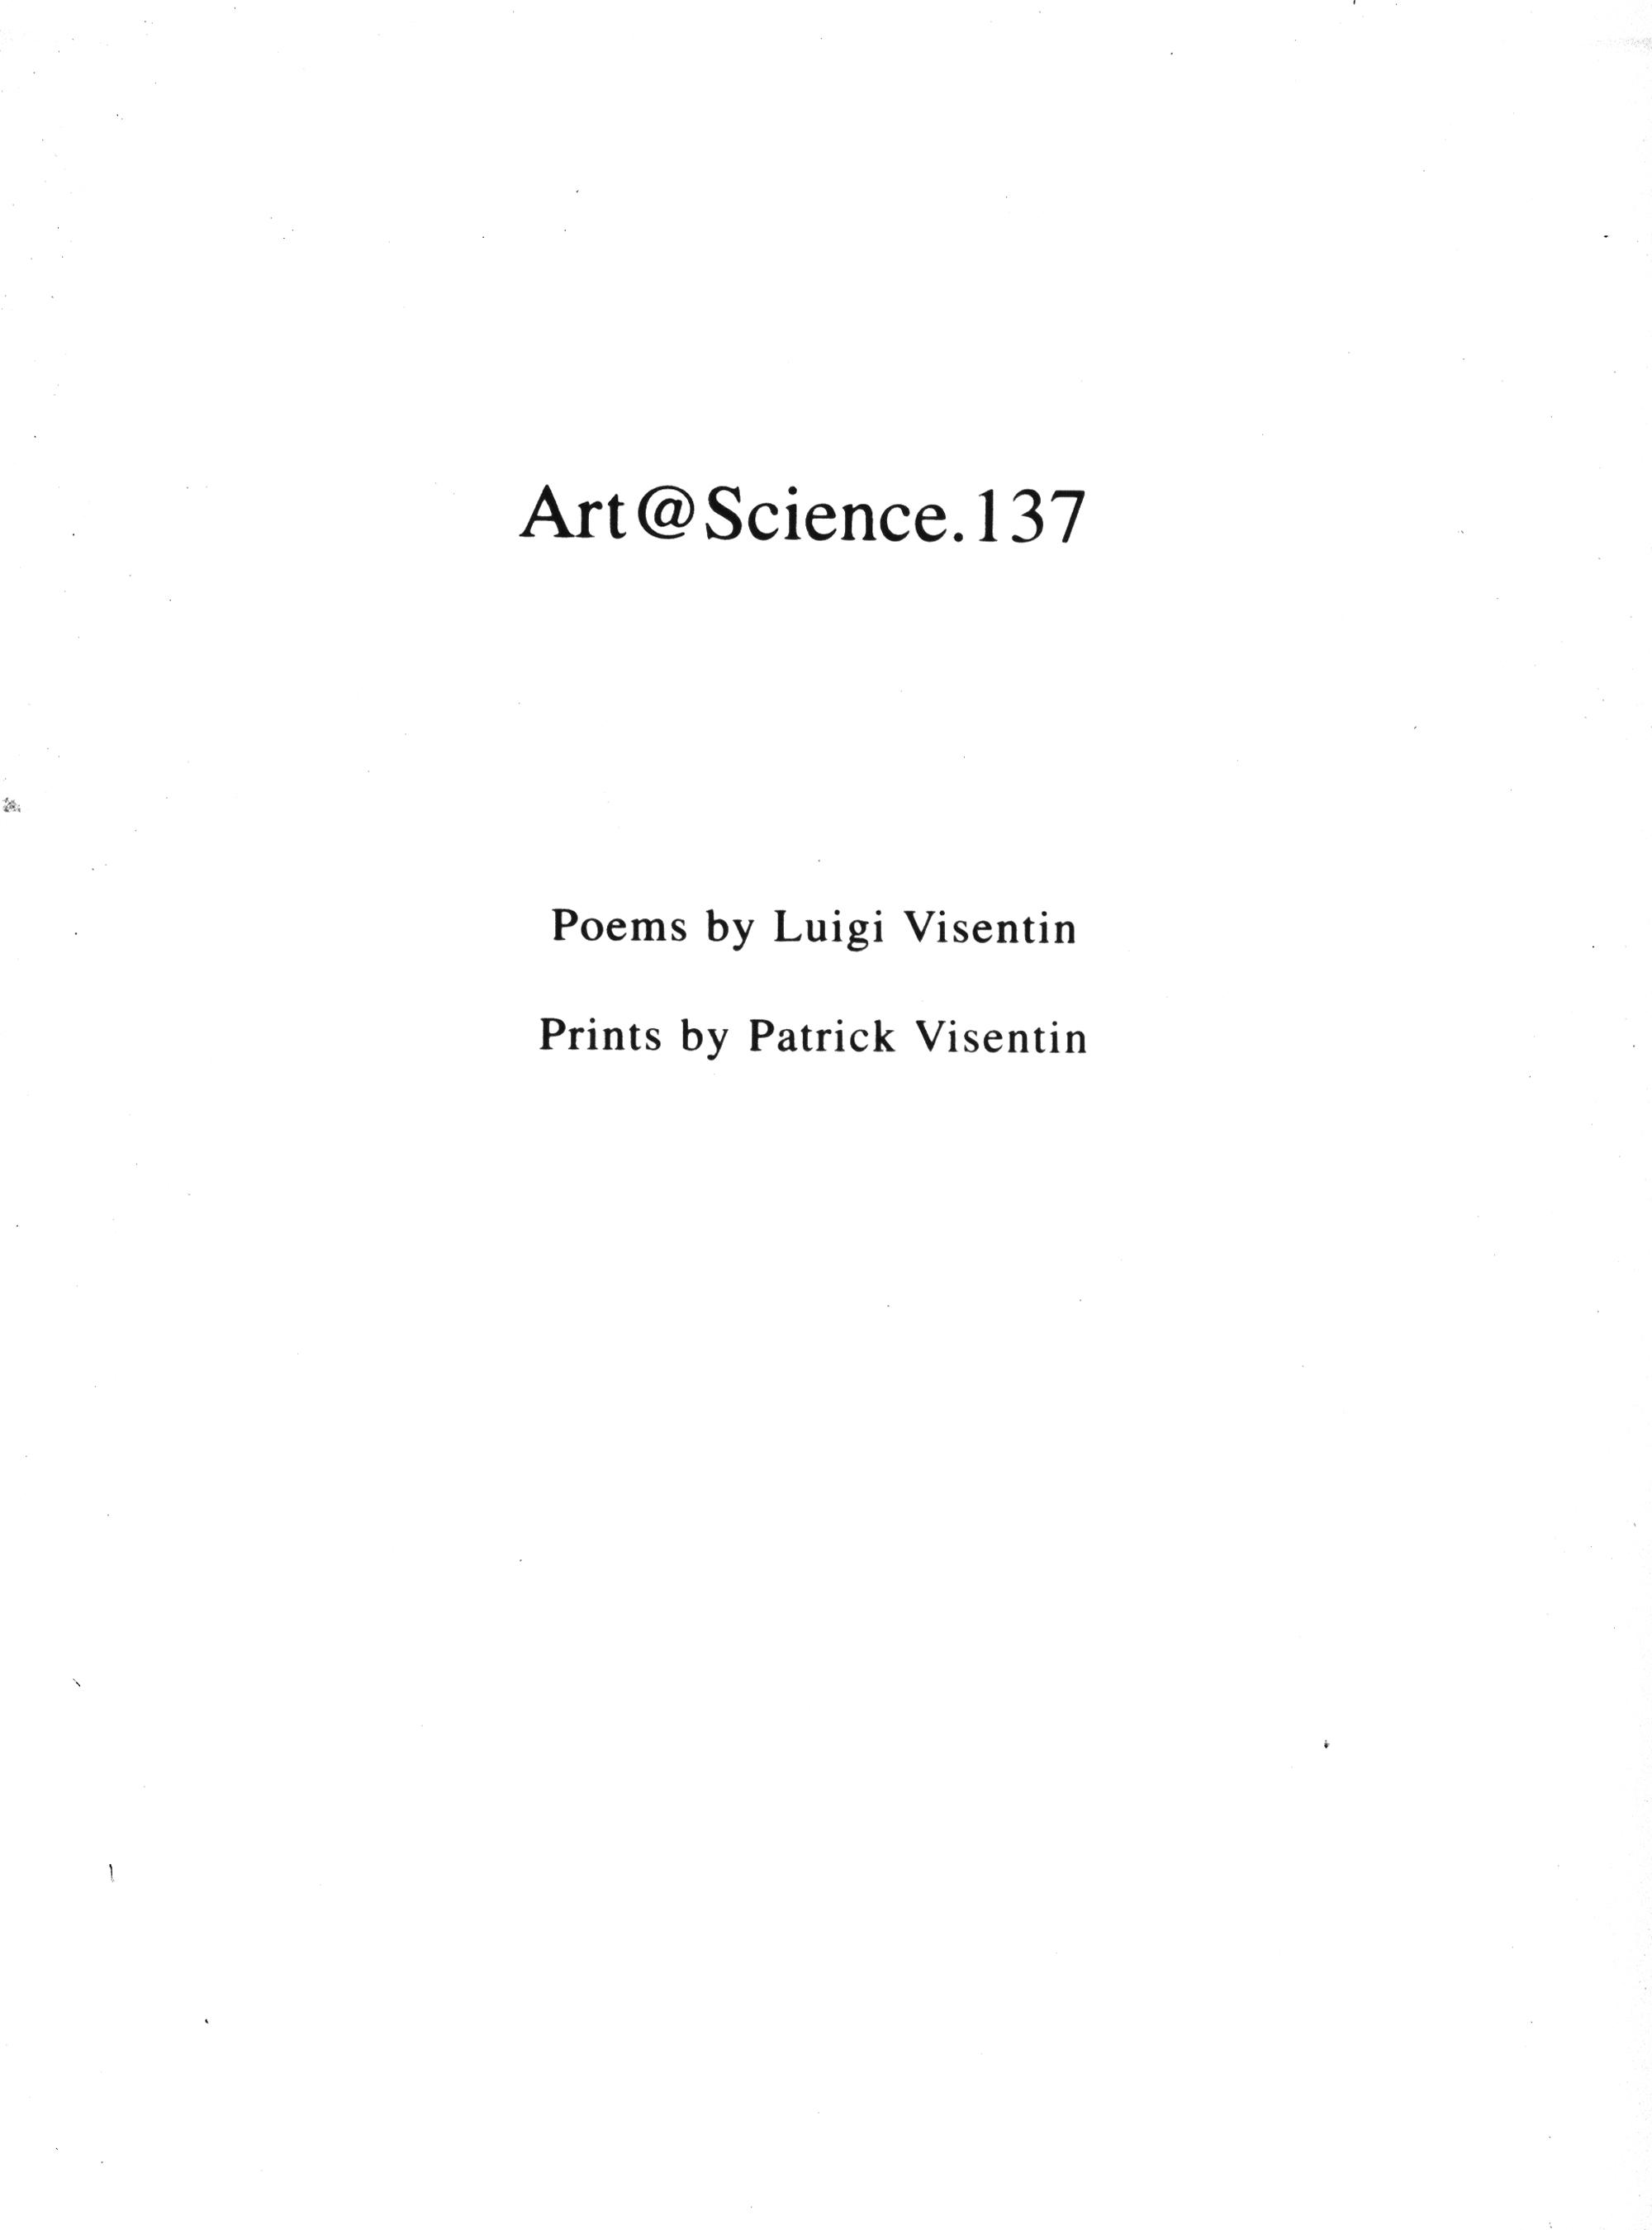 Art@Science137.jpg